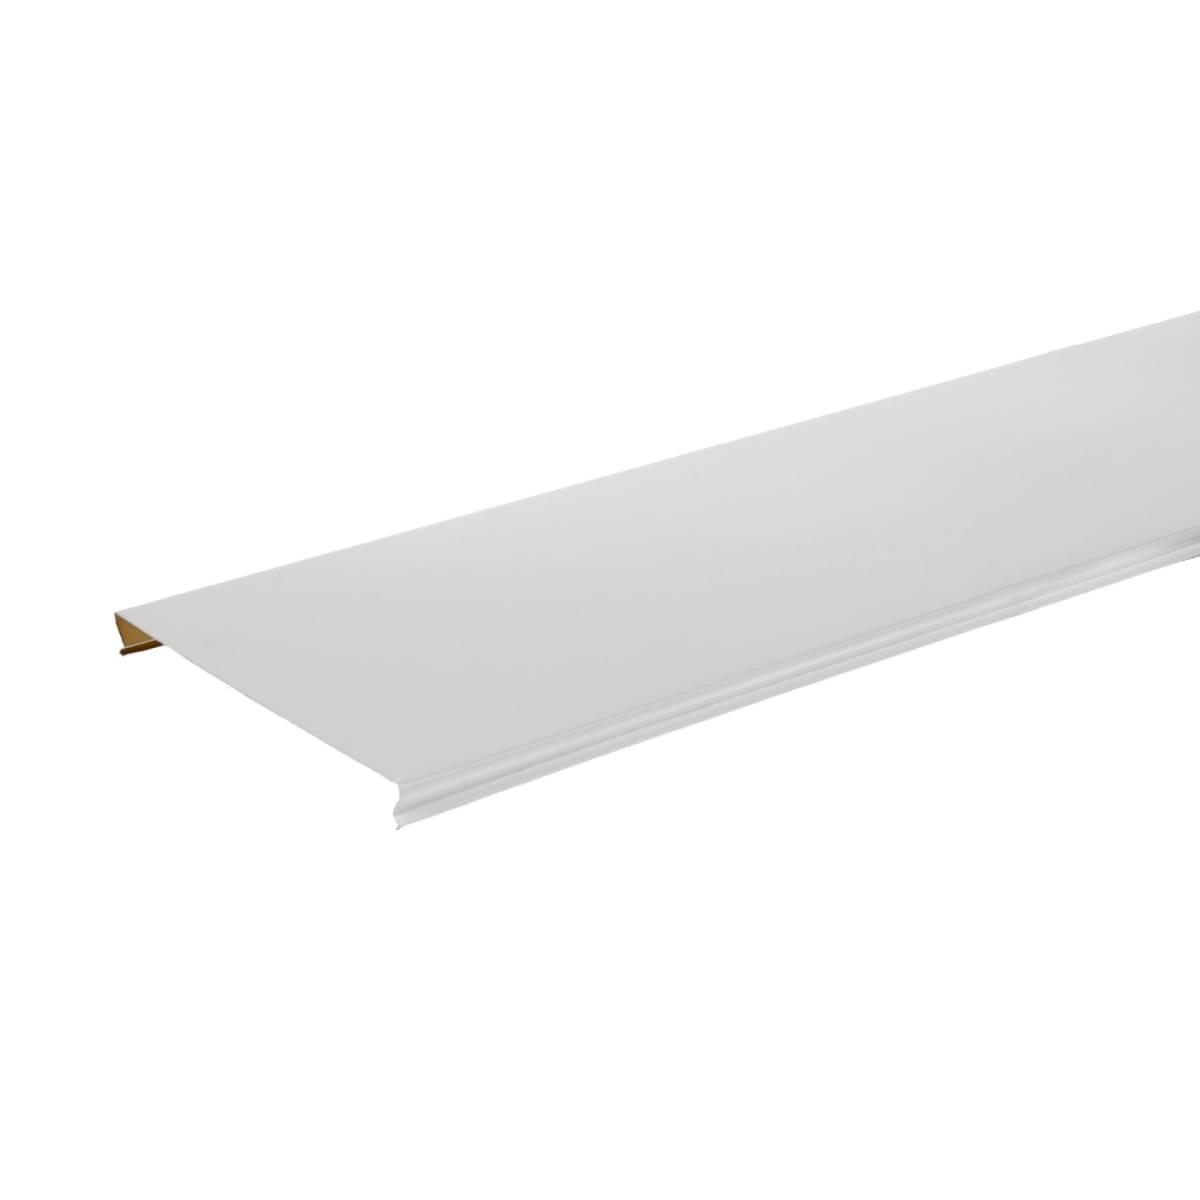 Набор реек Artens 2х1.05 м цвет белый матовый